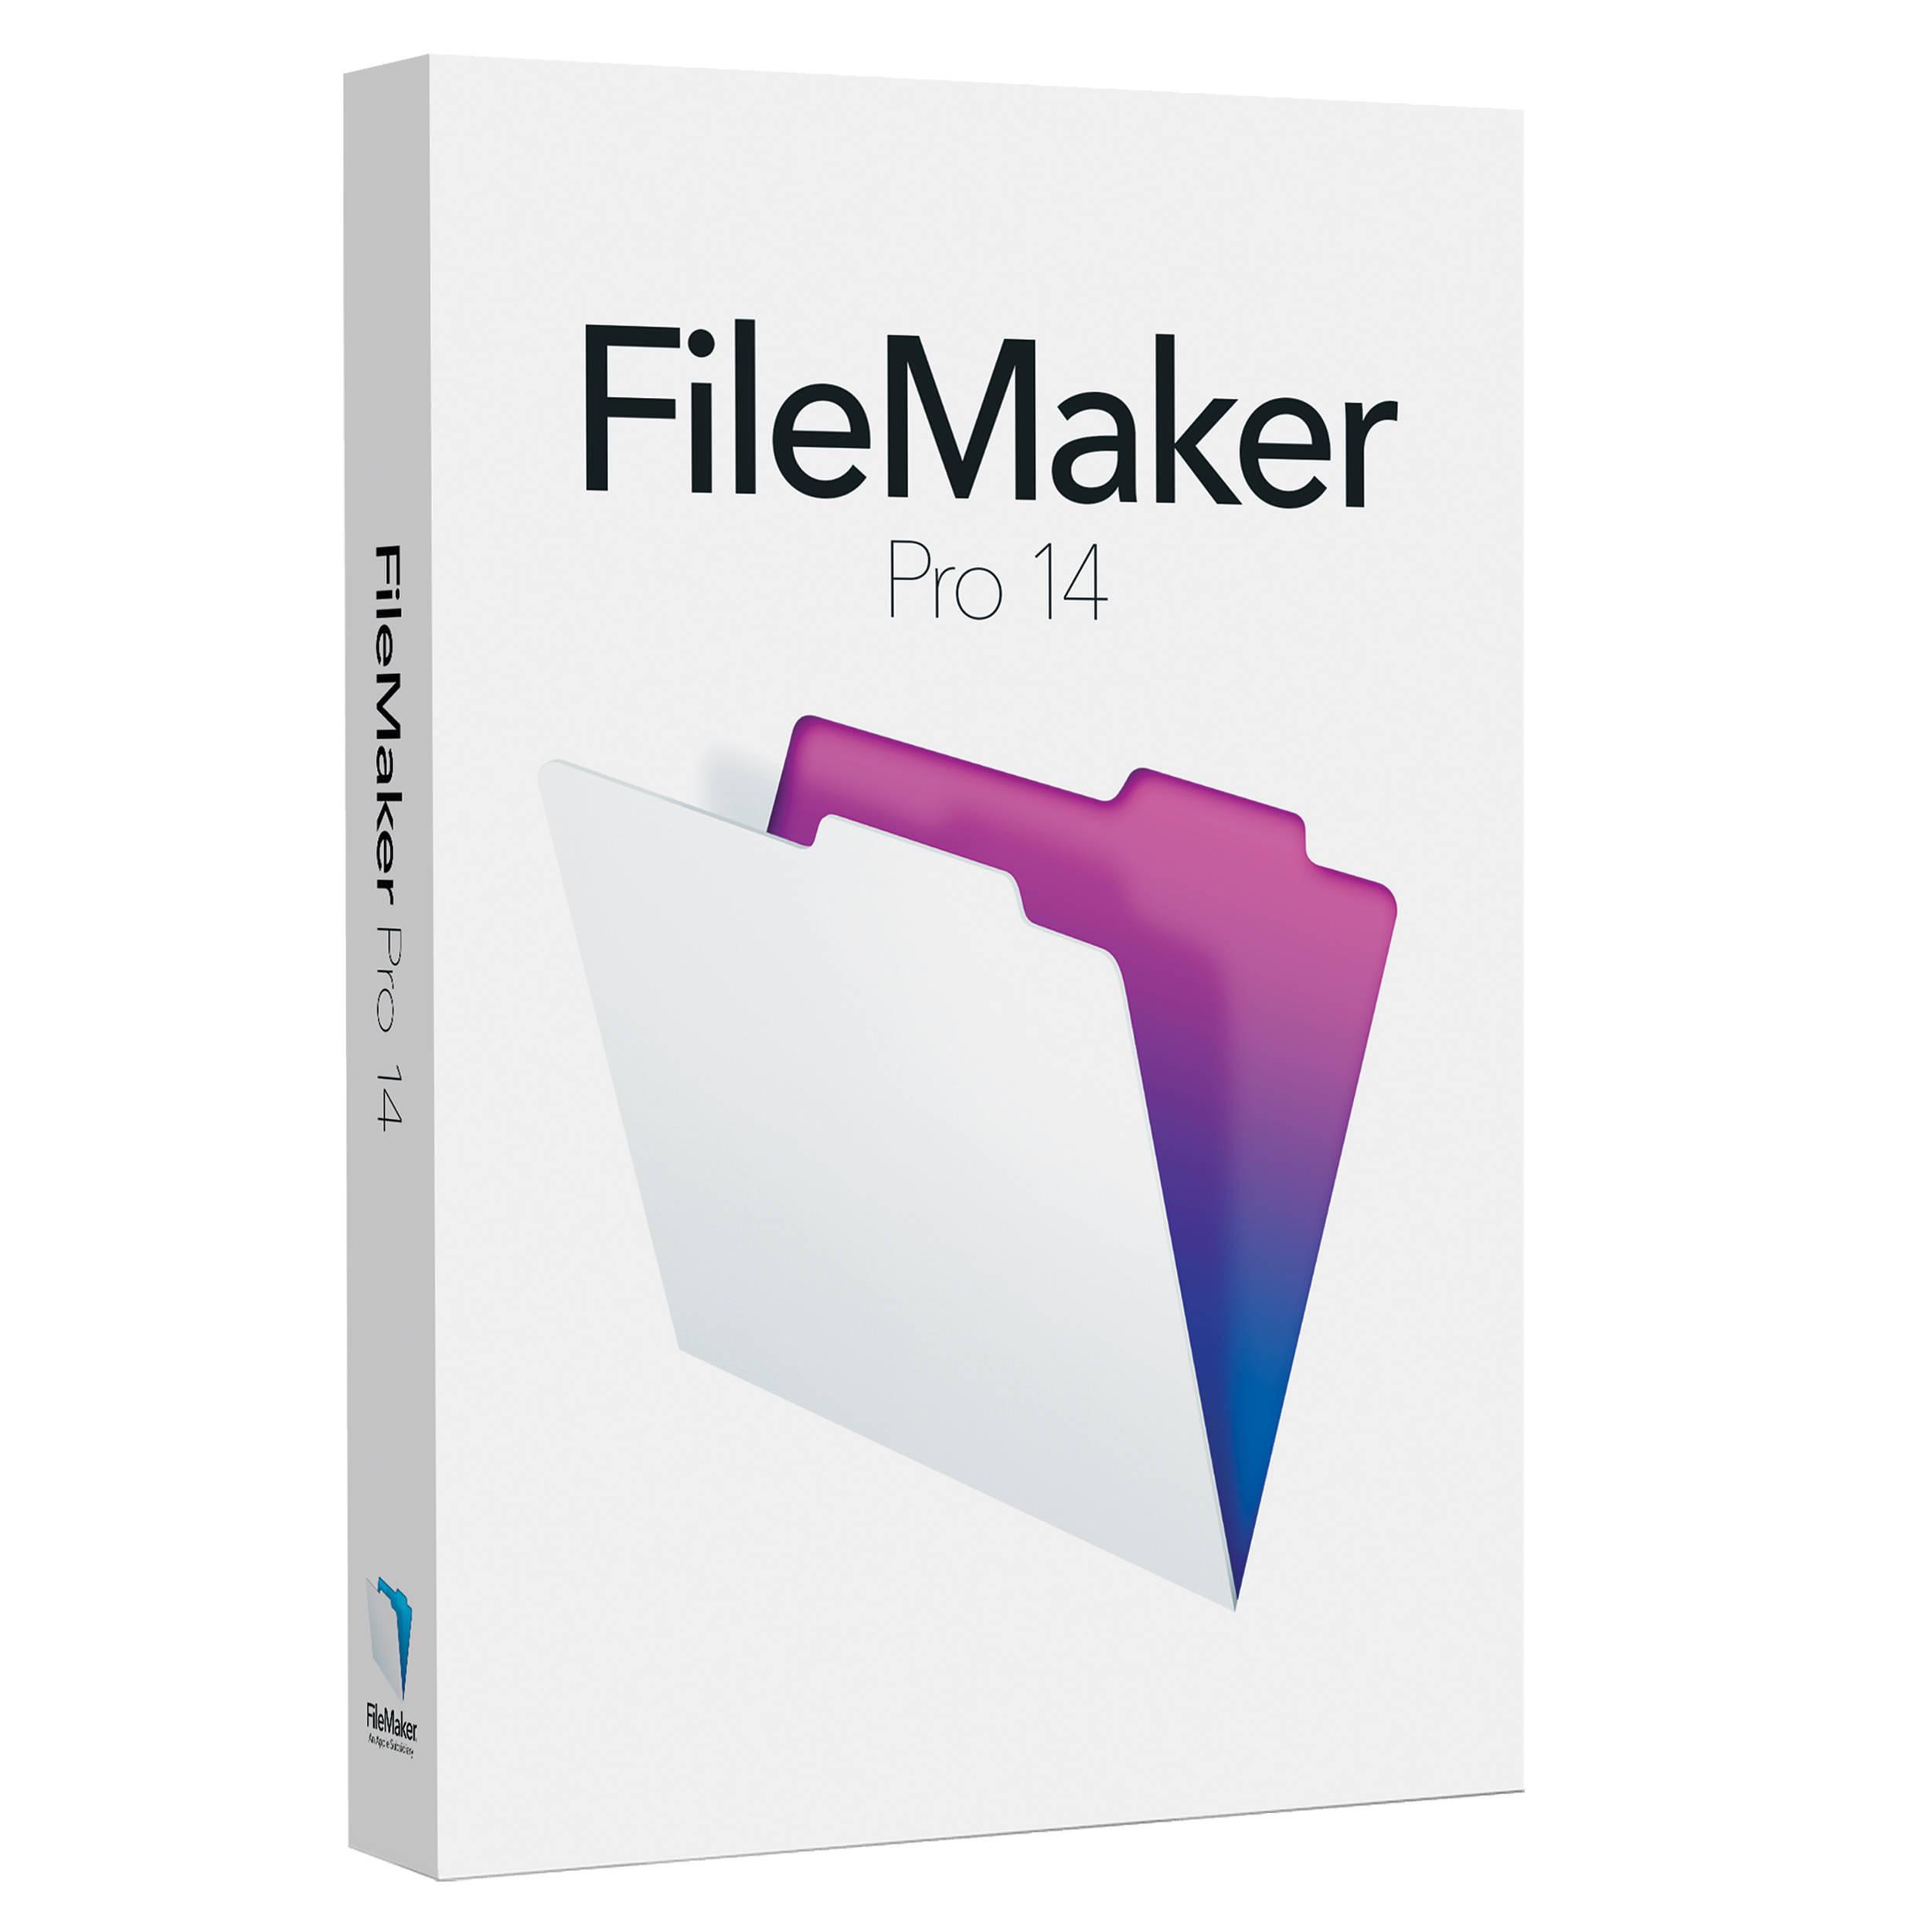 FileMaker Pro 14 (Upgrade Edition)